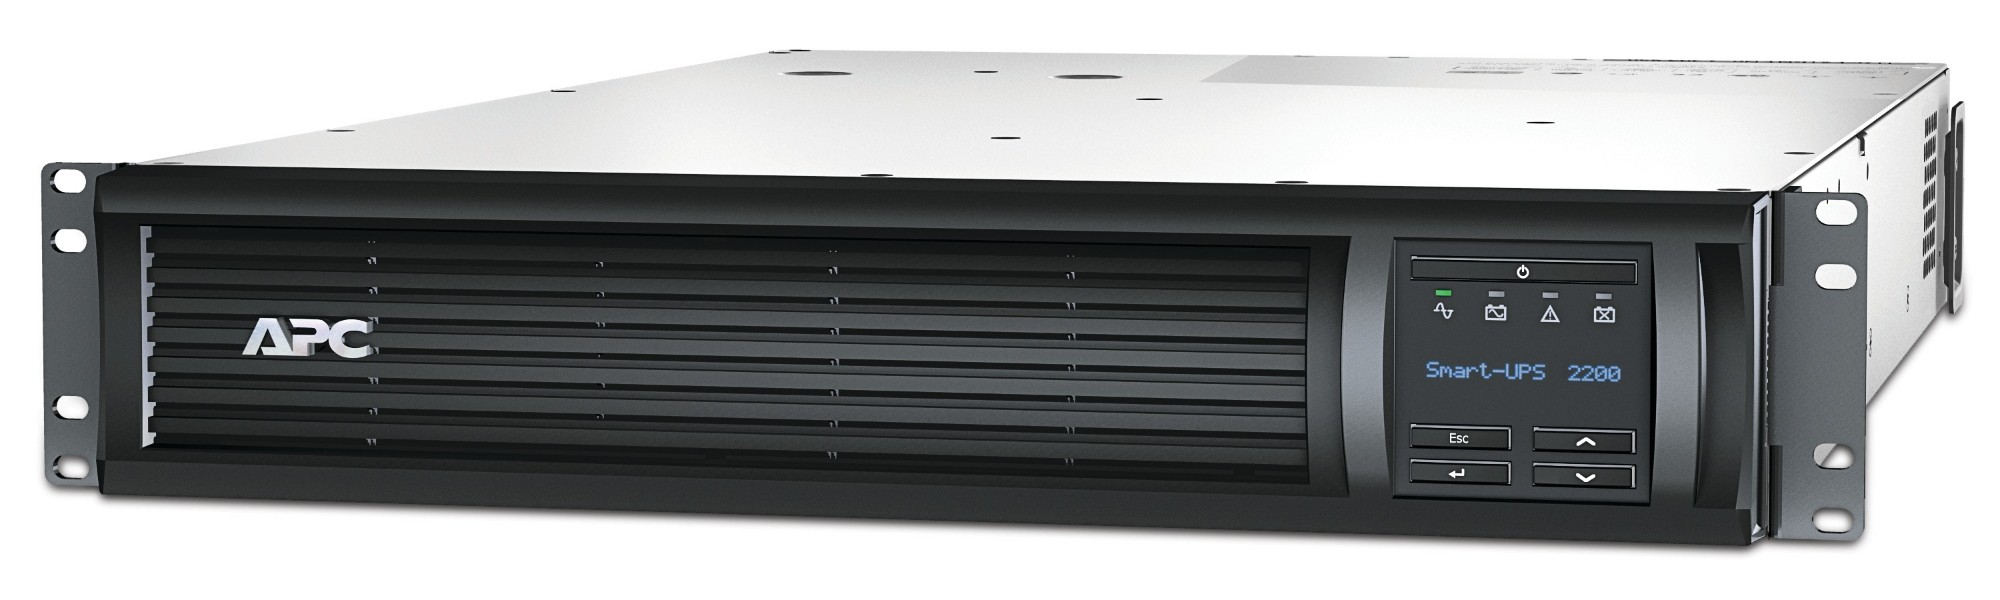 APC Smart-UPS 2200VA Line-Interactive 9 AC outlet(s)